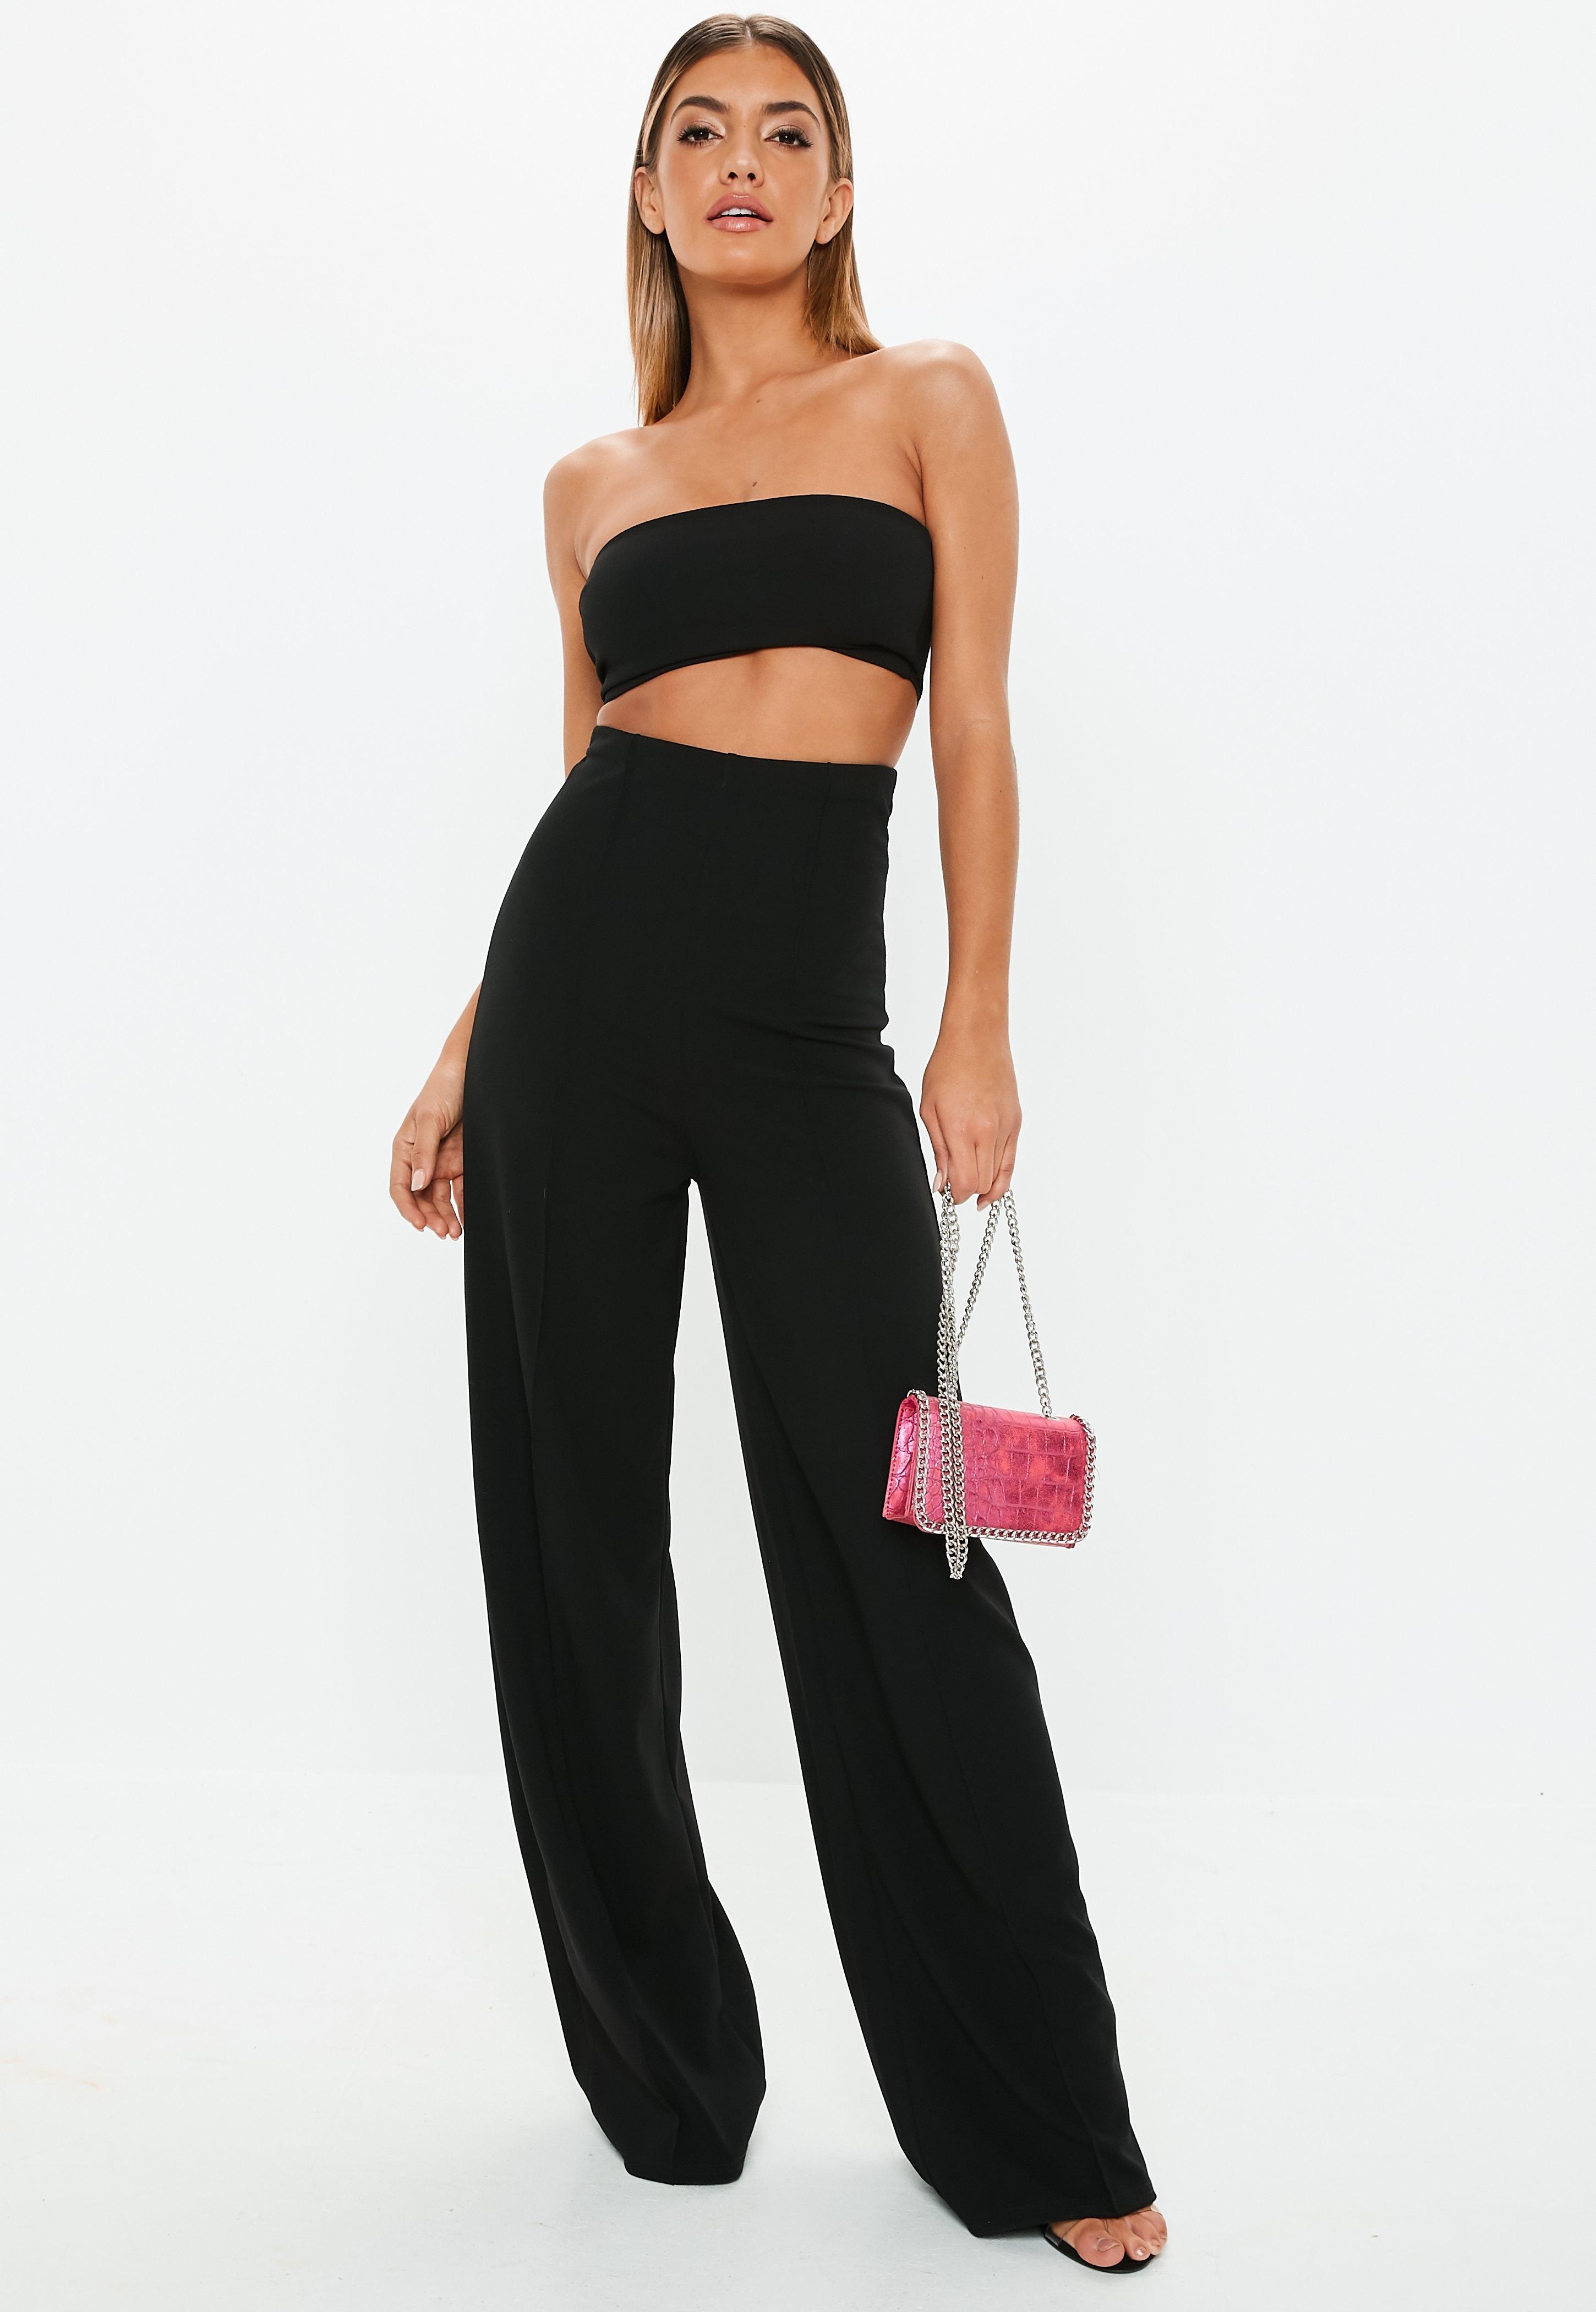 e814a643a09 High Waisted Pants - Women s High Rise Pants